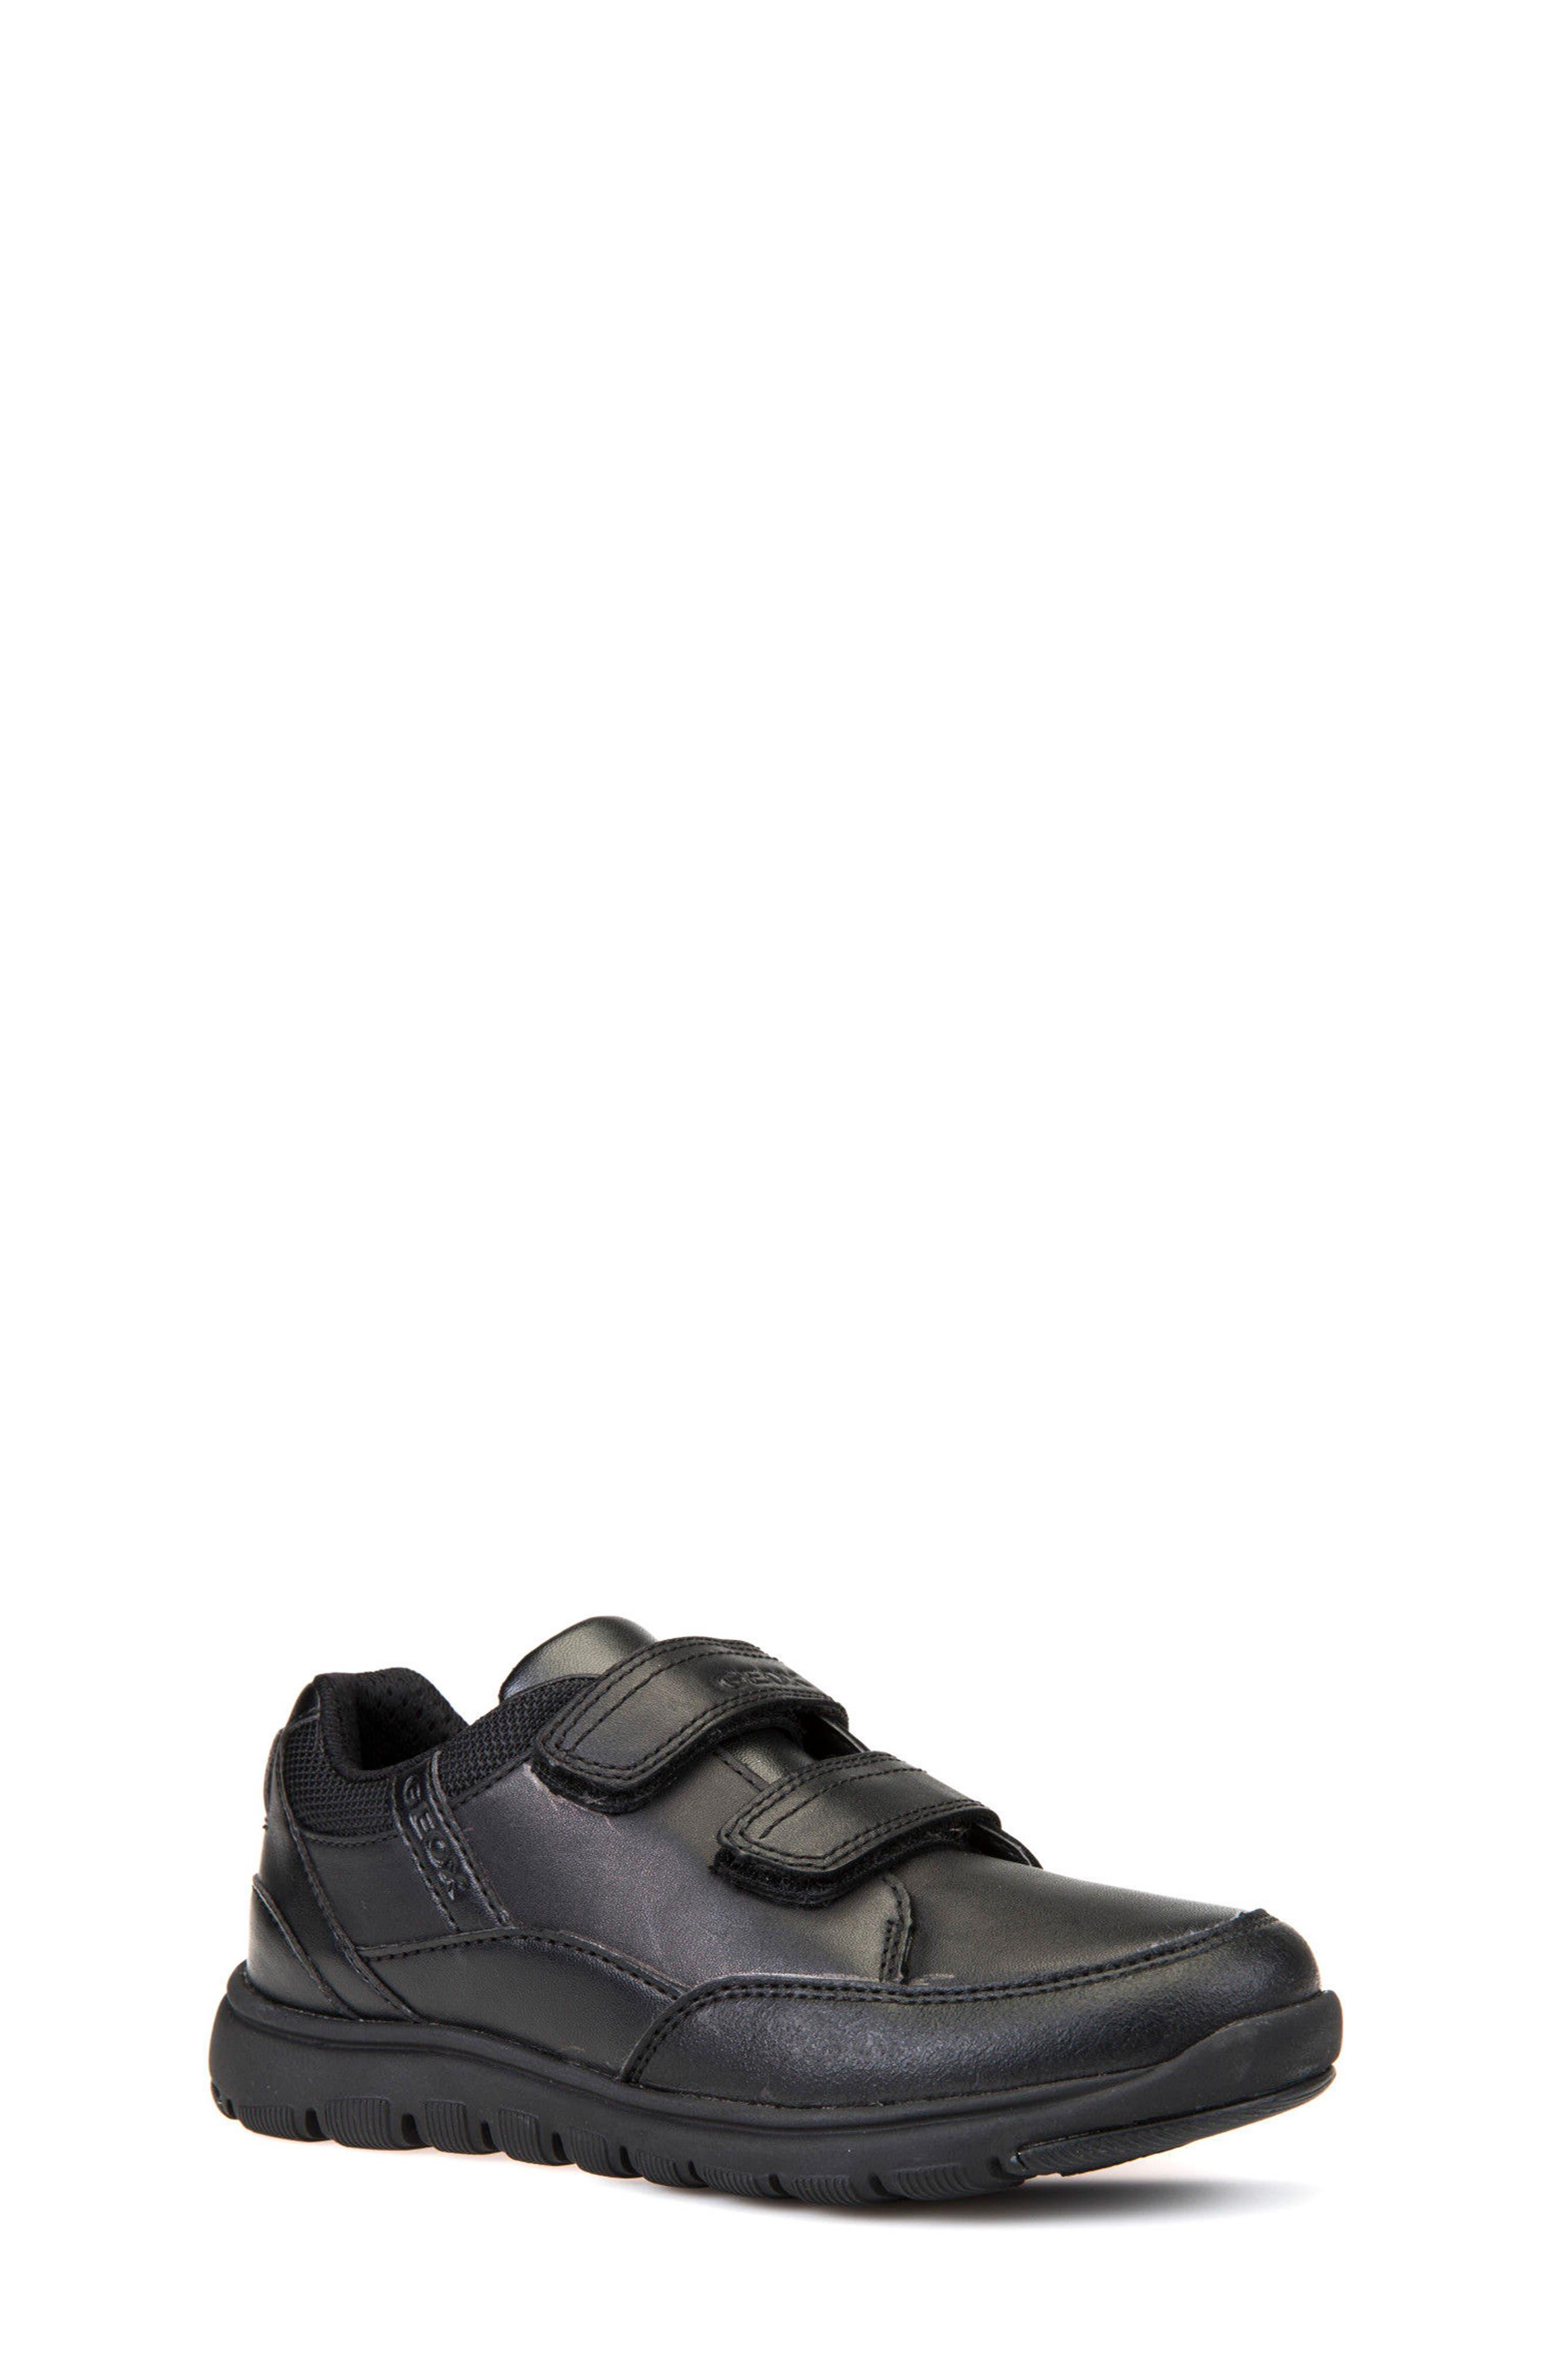 Xunday Low Top Sneaker,                             Main thumbnail 1, color,                             BLACK